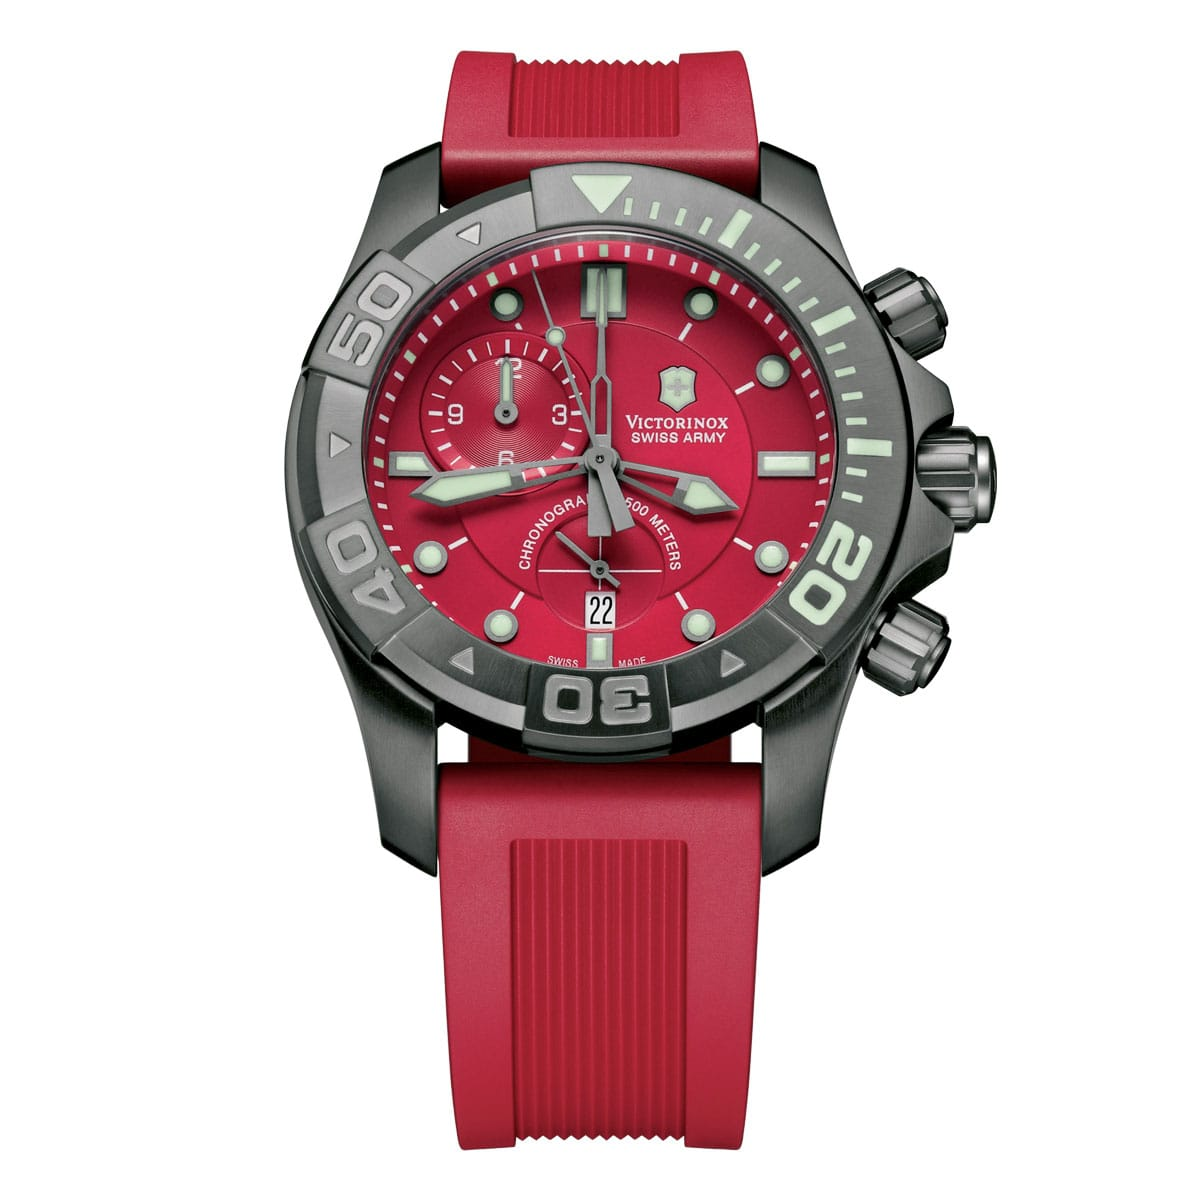 Victorinox-Dive-Master-Automatique-241422 Lionel Meylan Horlogerie Joaillerie Vevey